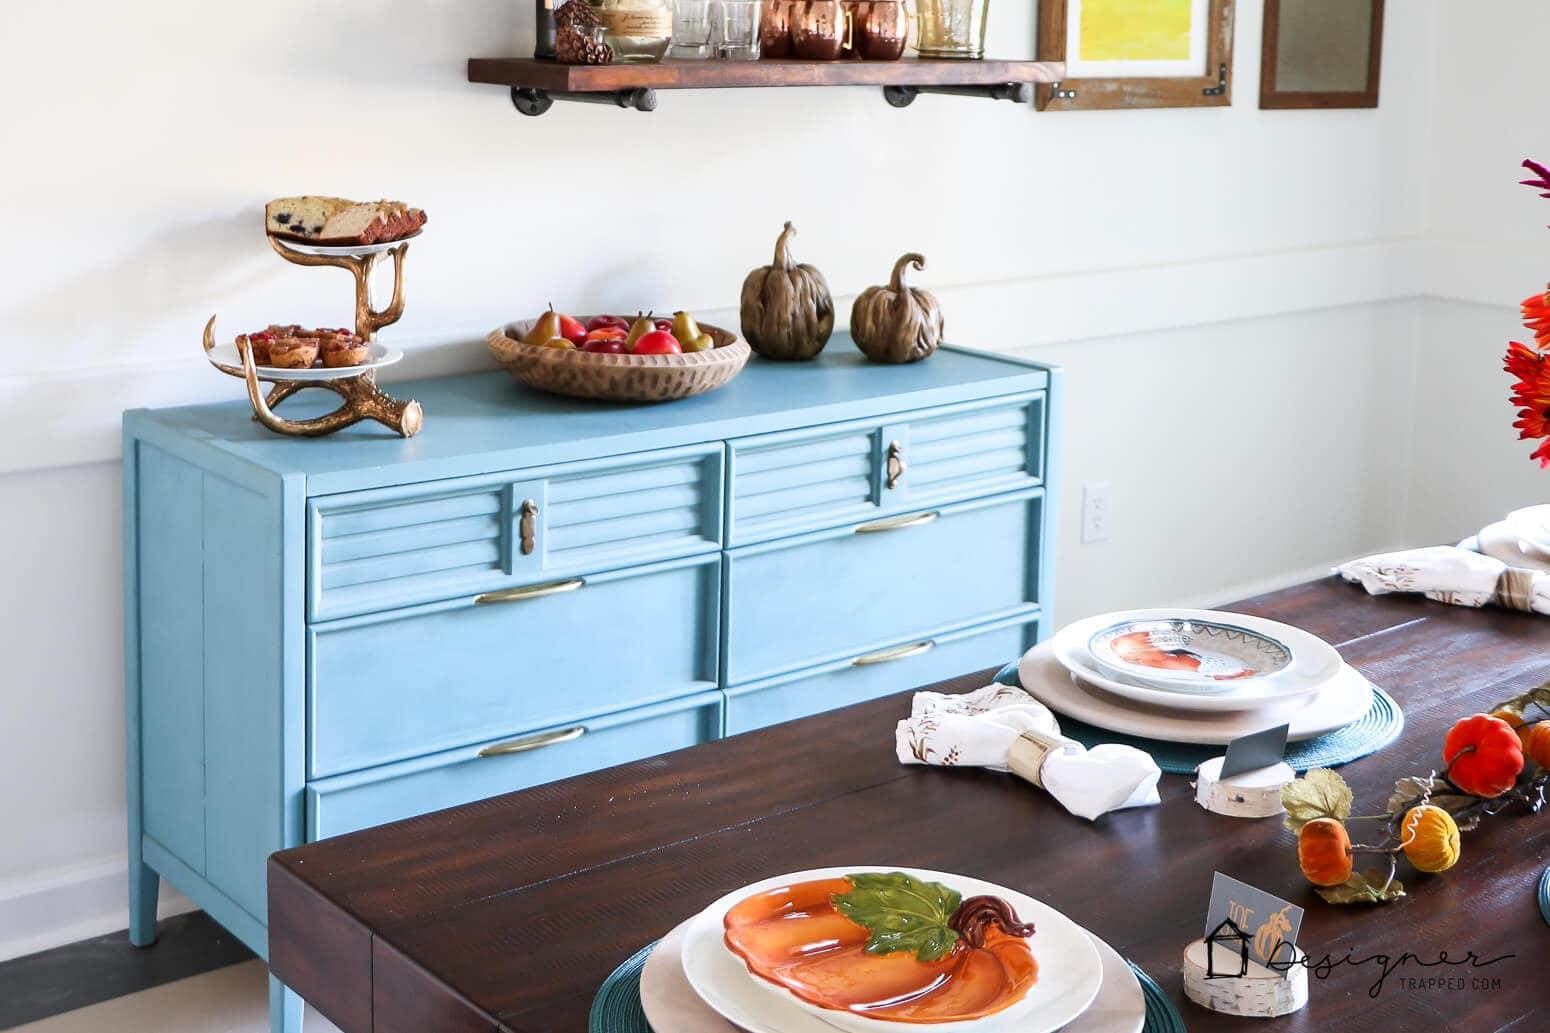 DIY painted furniture tutorial